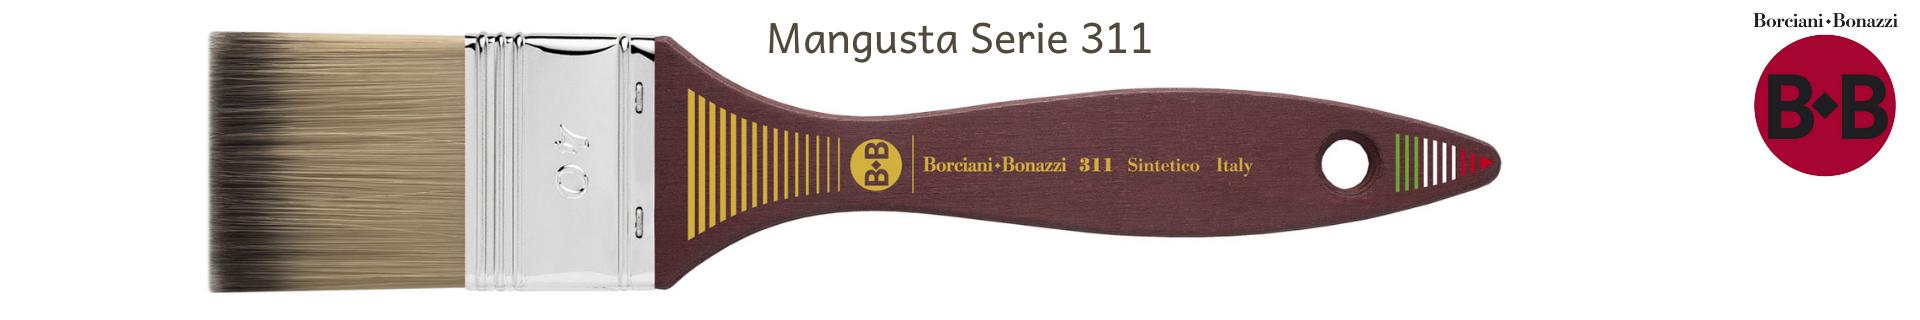 Borciani e Bonazzi Pennellessa Mangusta 311